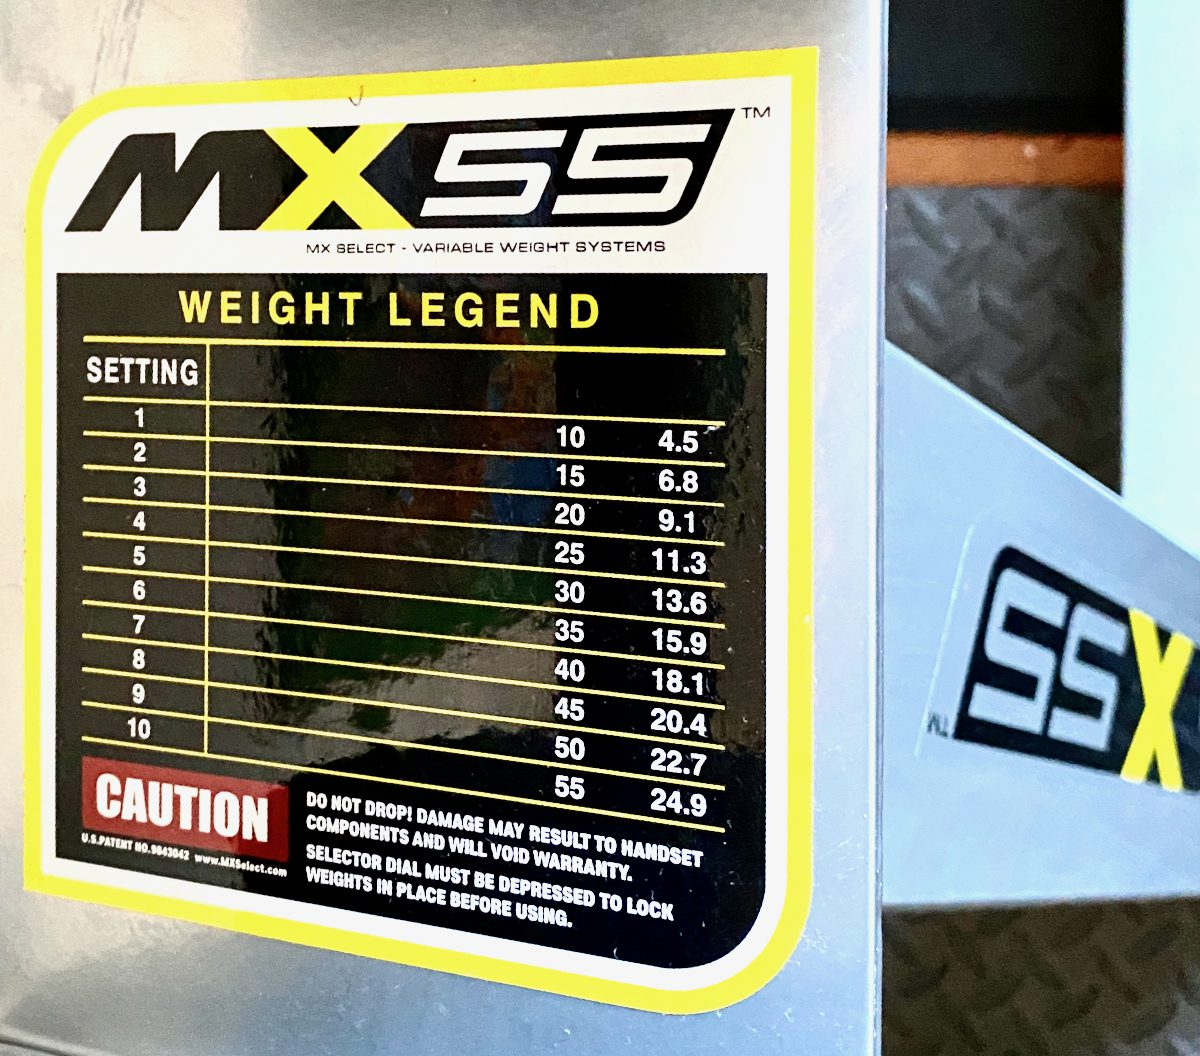 MX55 adjustable dumbbells weight legend